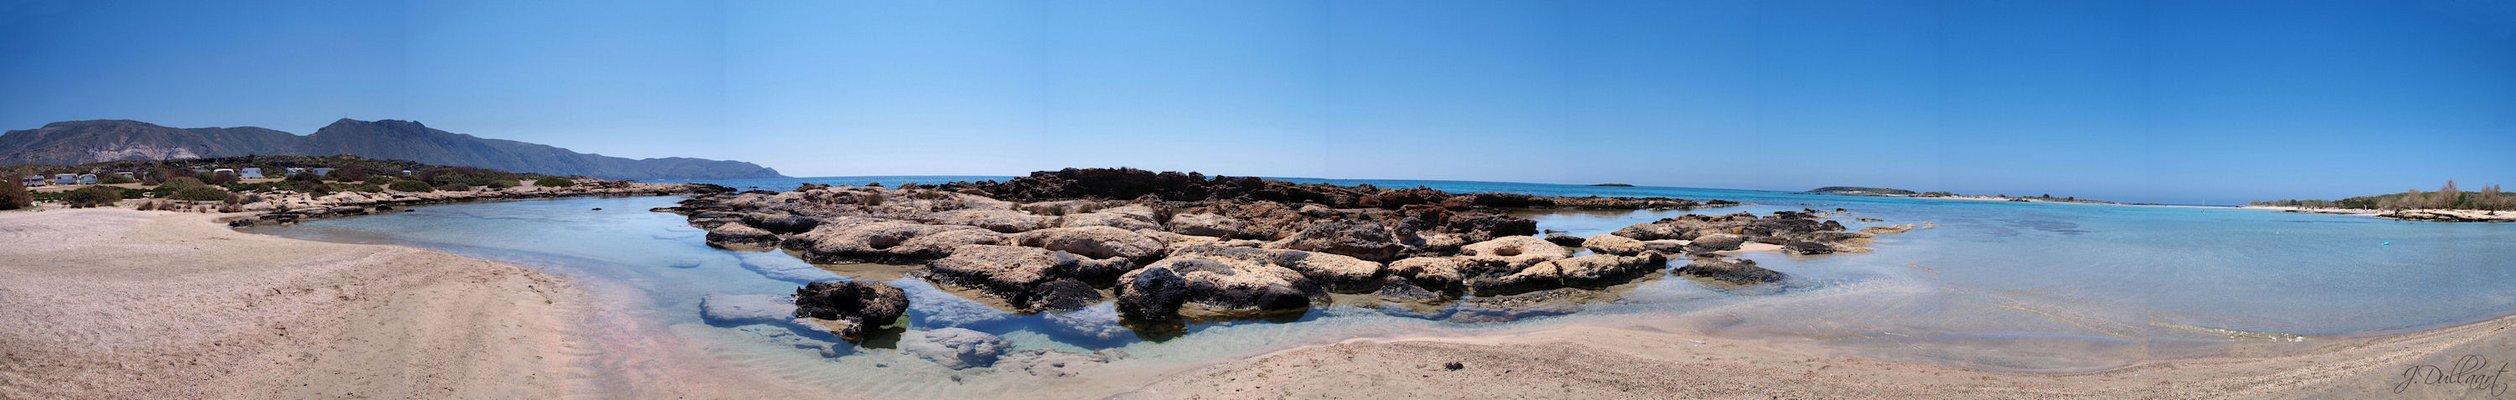 Elafoniso Panorama